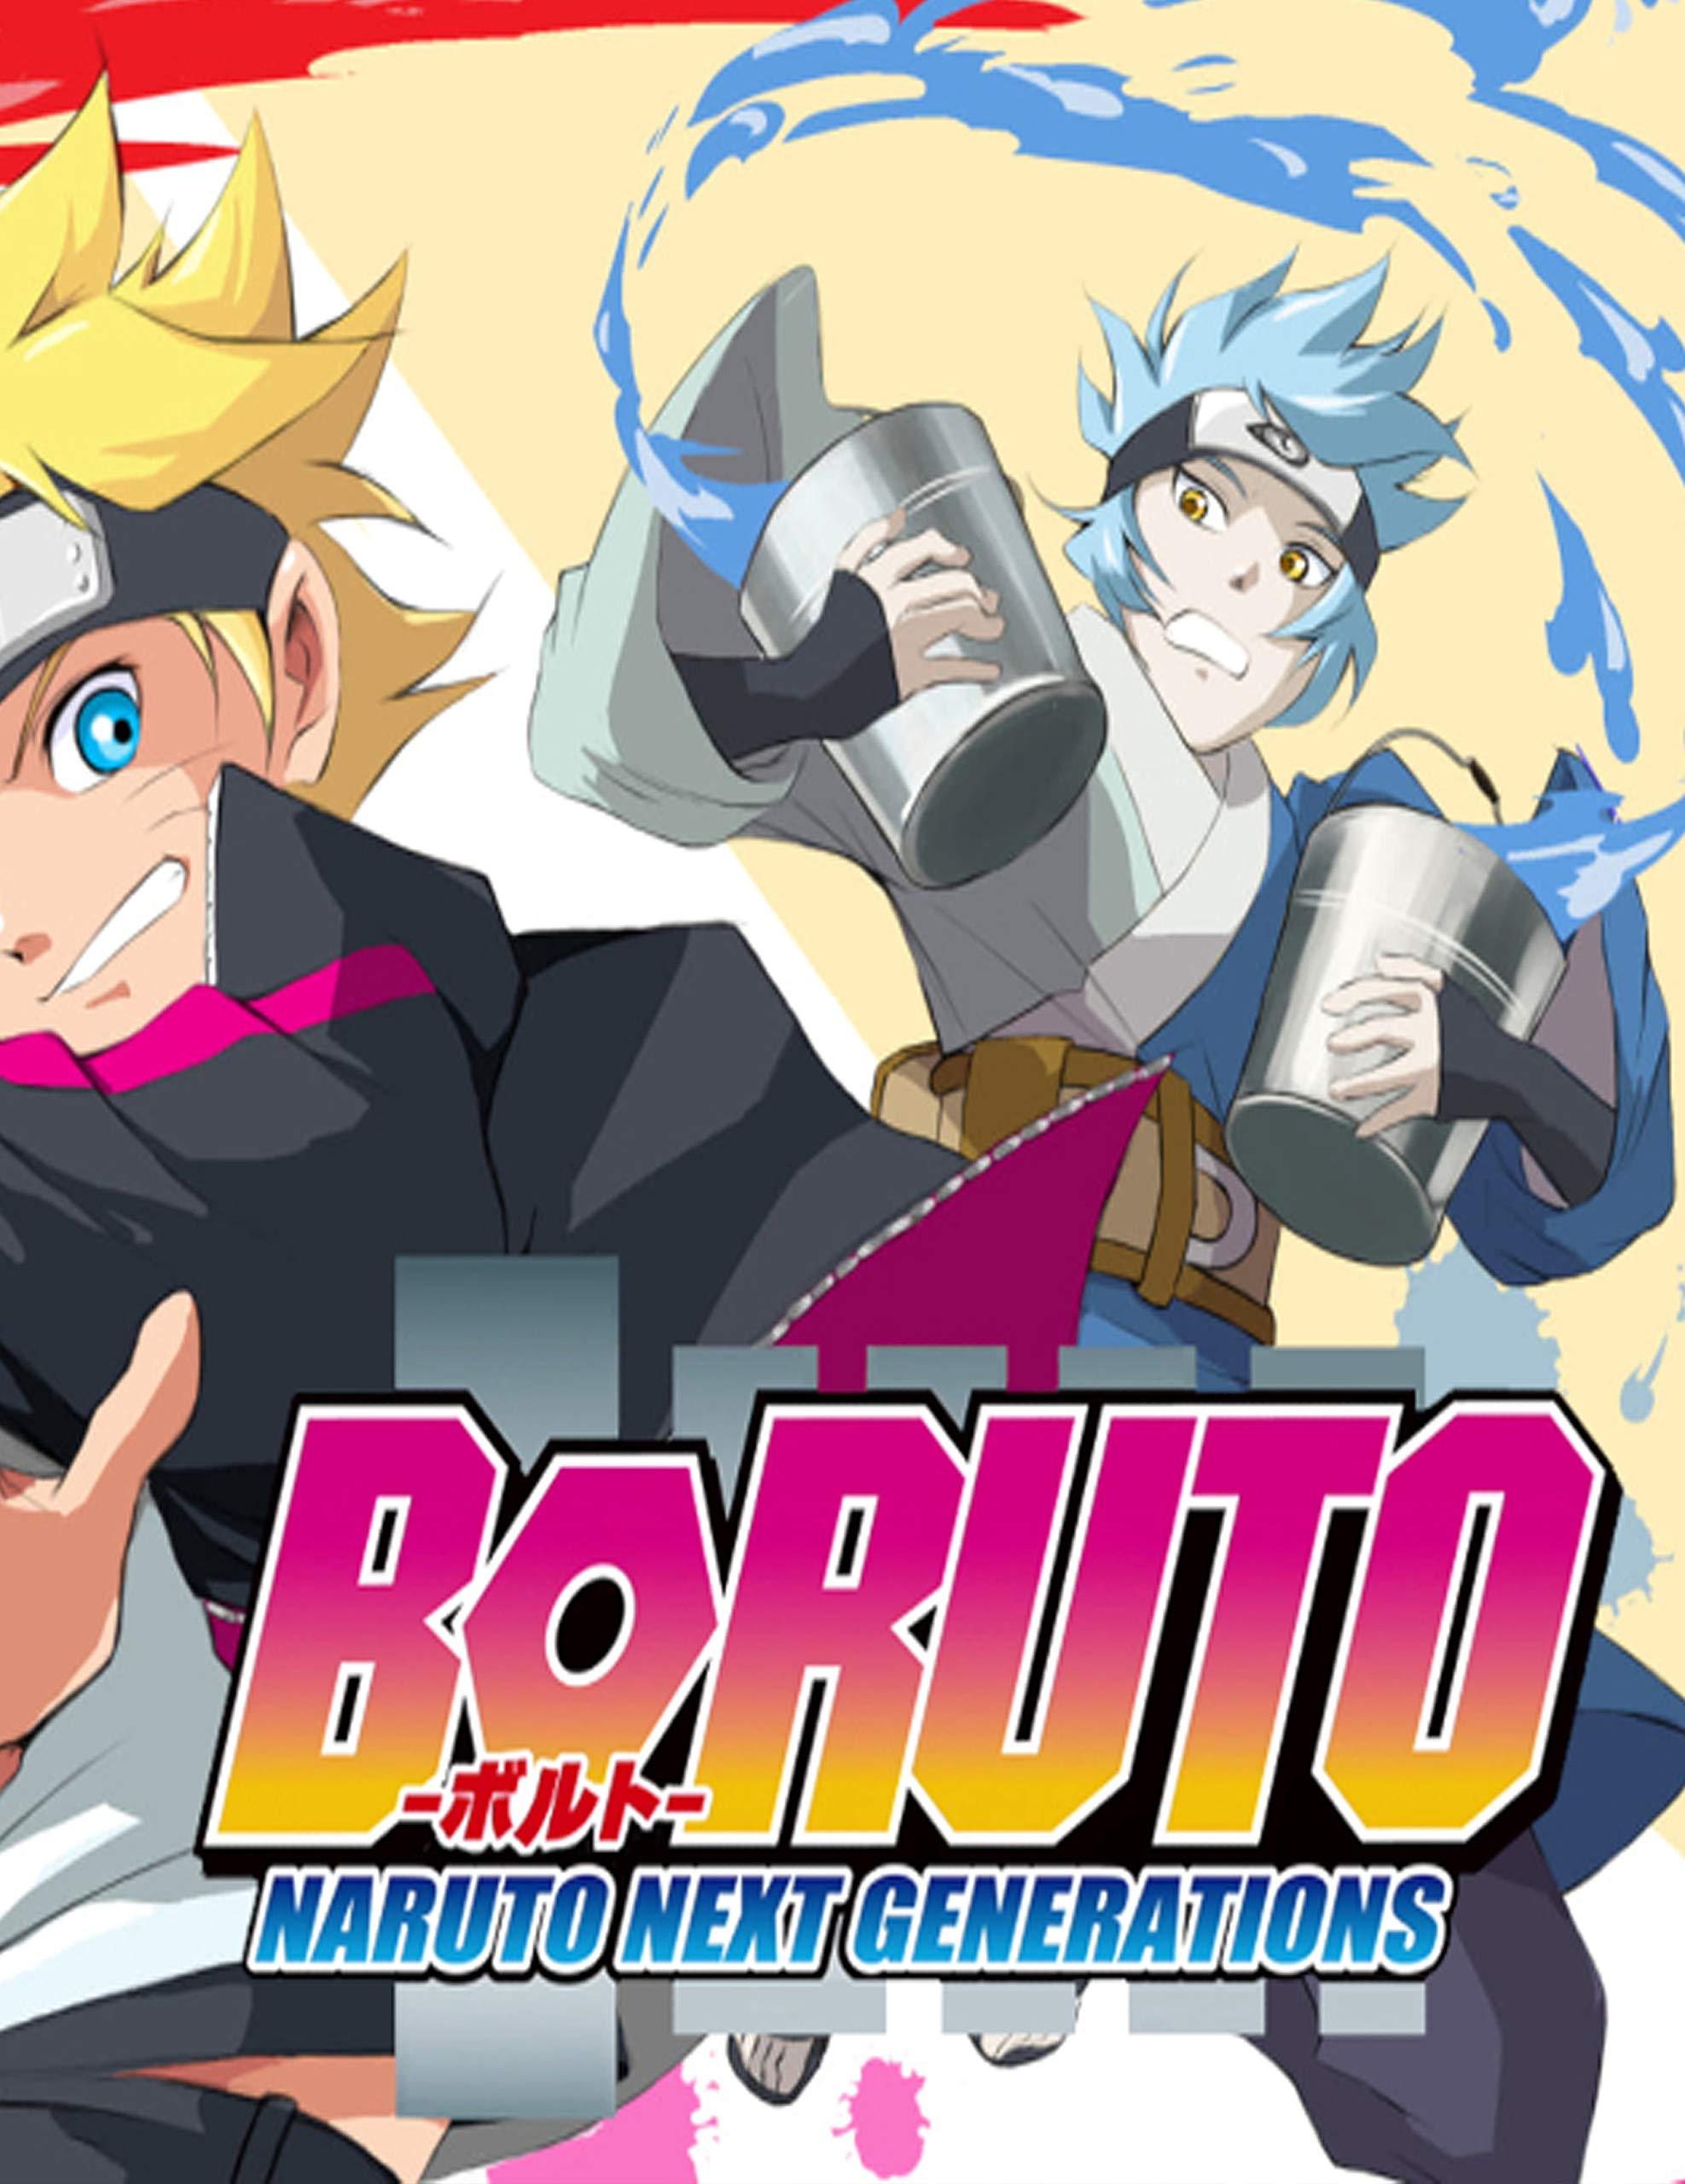 Naruto Next Generations Deluxe Manga: Boruto Manga best manga Vol 2